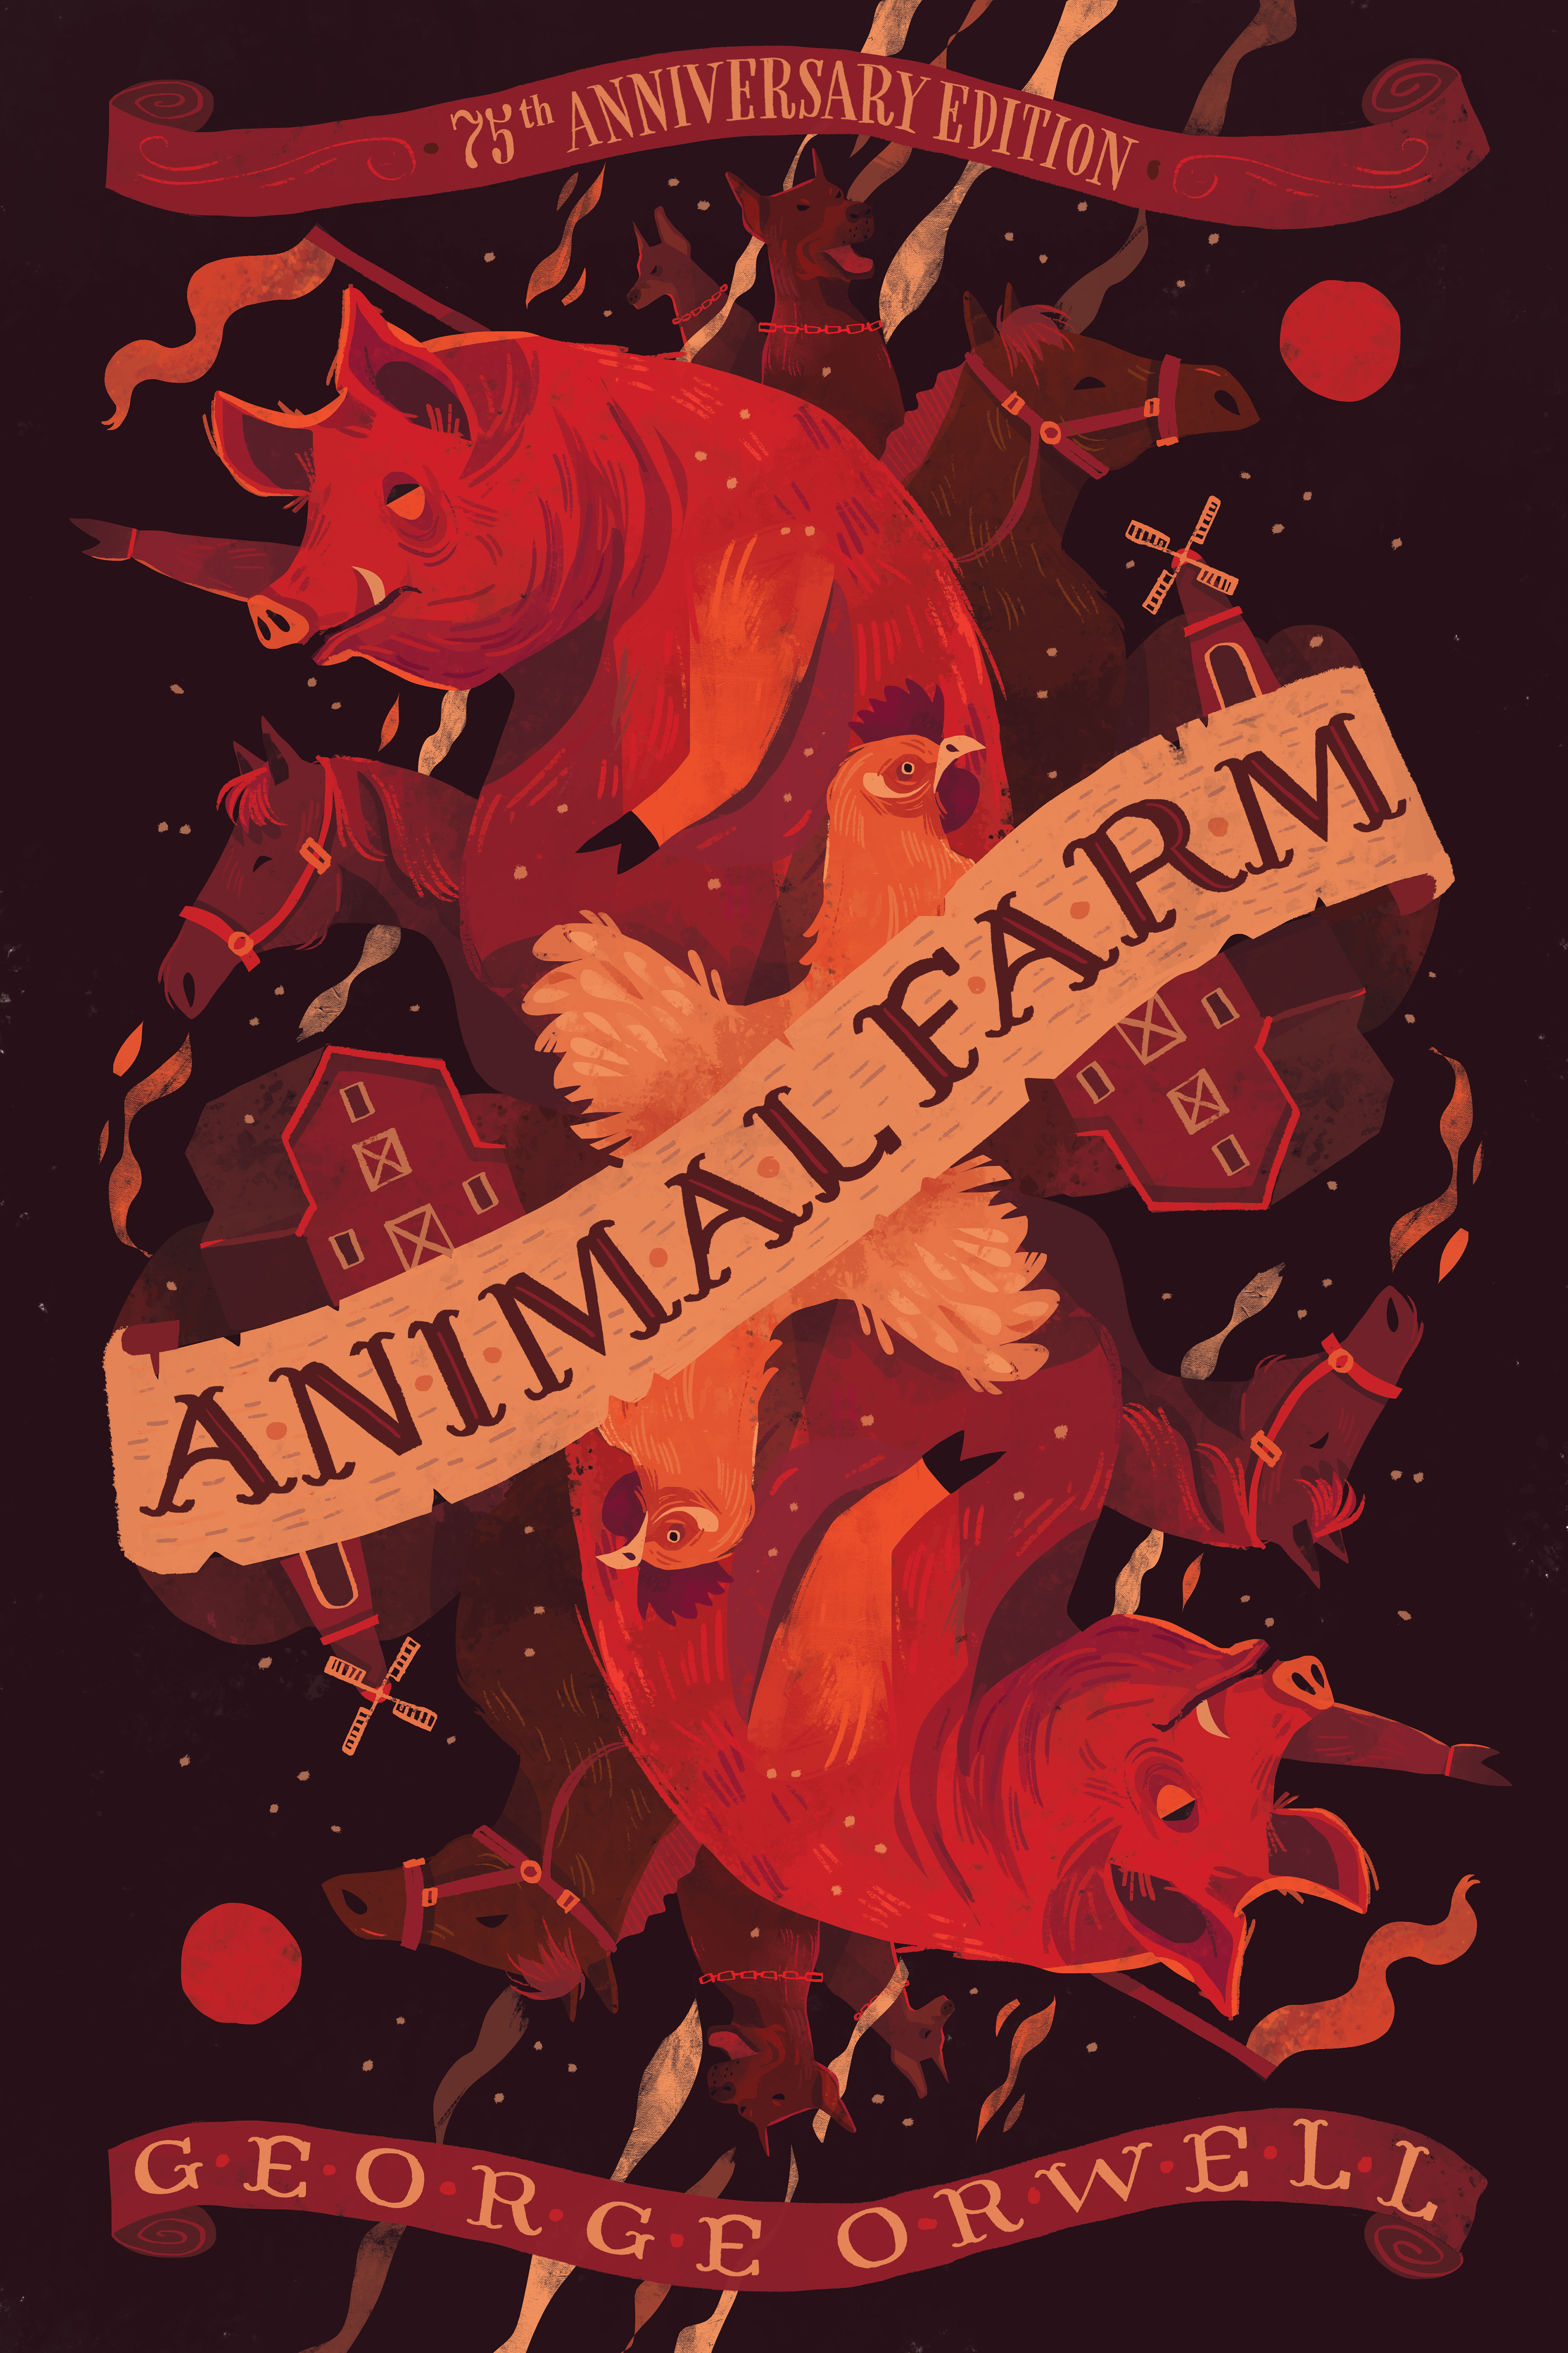 Chaaya Prabhat S Portfolio Animal Farm By George Orwell Book Cover Design